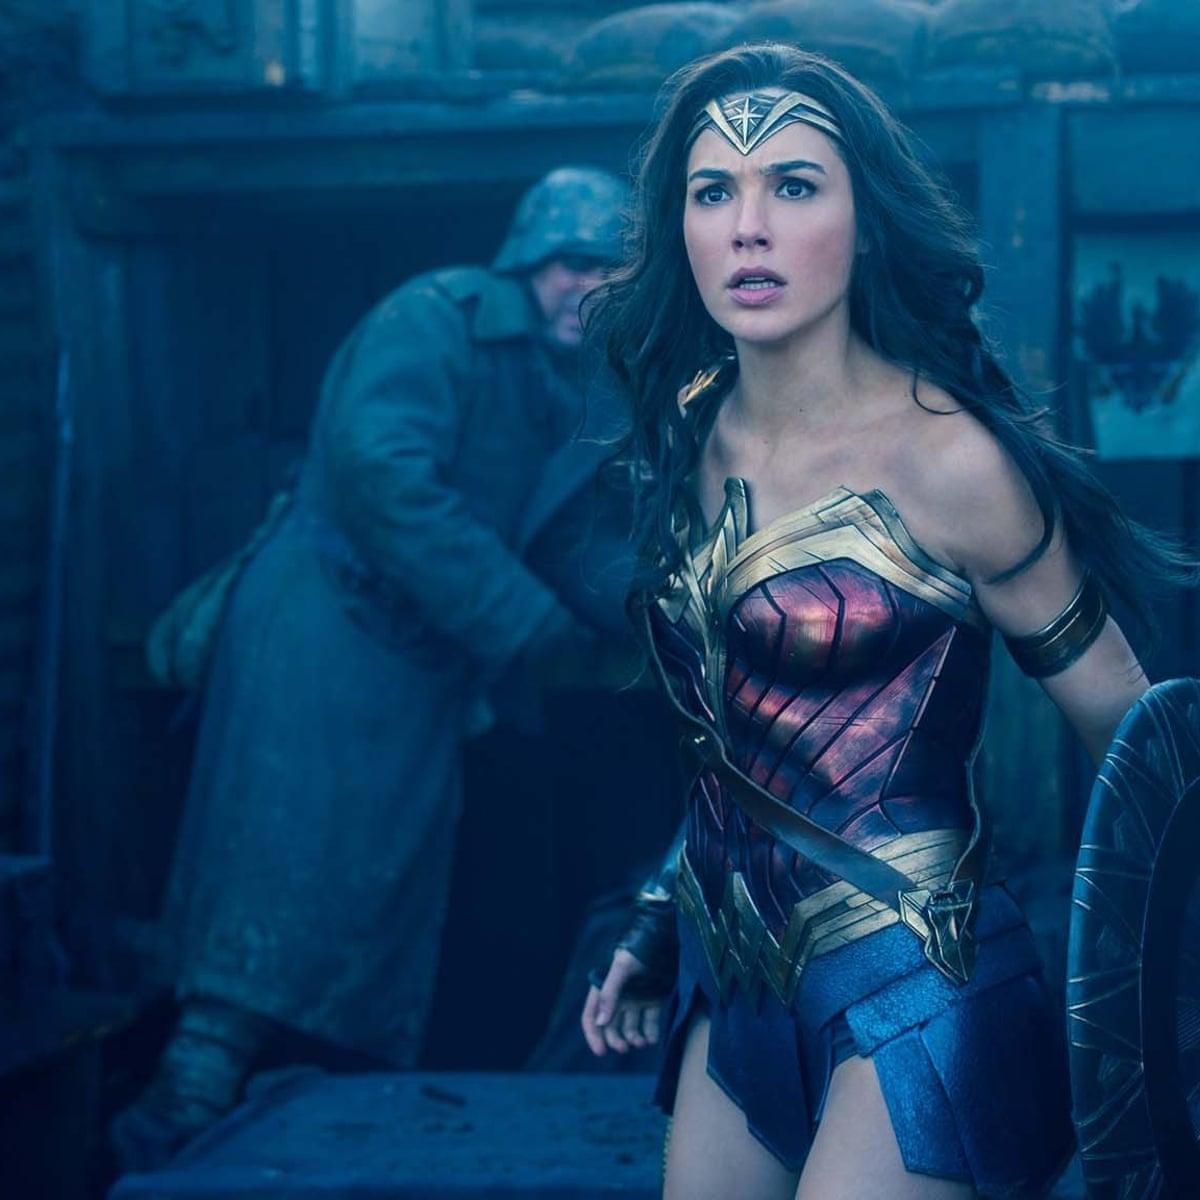 Wonder Woman Review A Gloriously Badass Breath Of Fresh Air Wonder Woman The Guardian